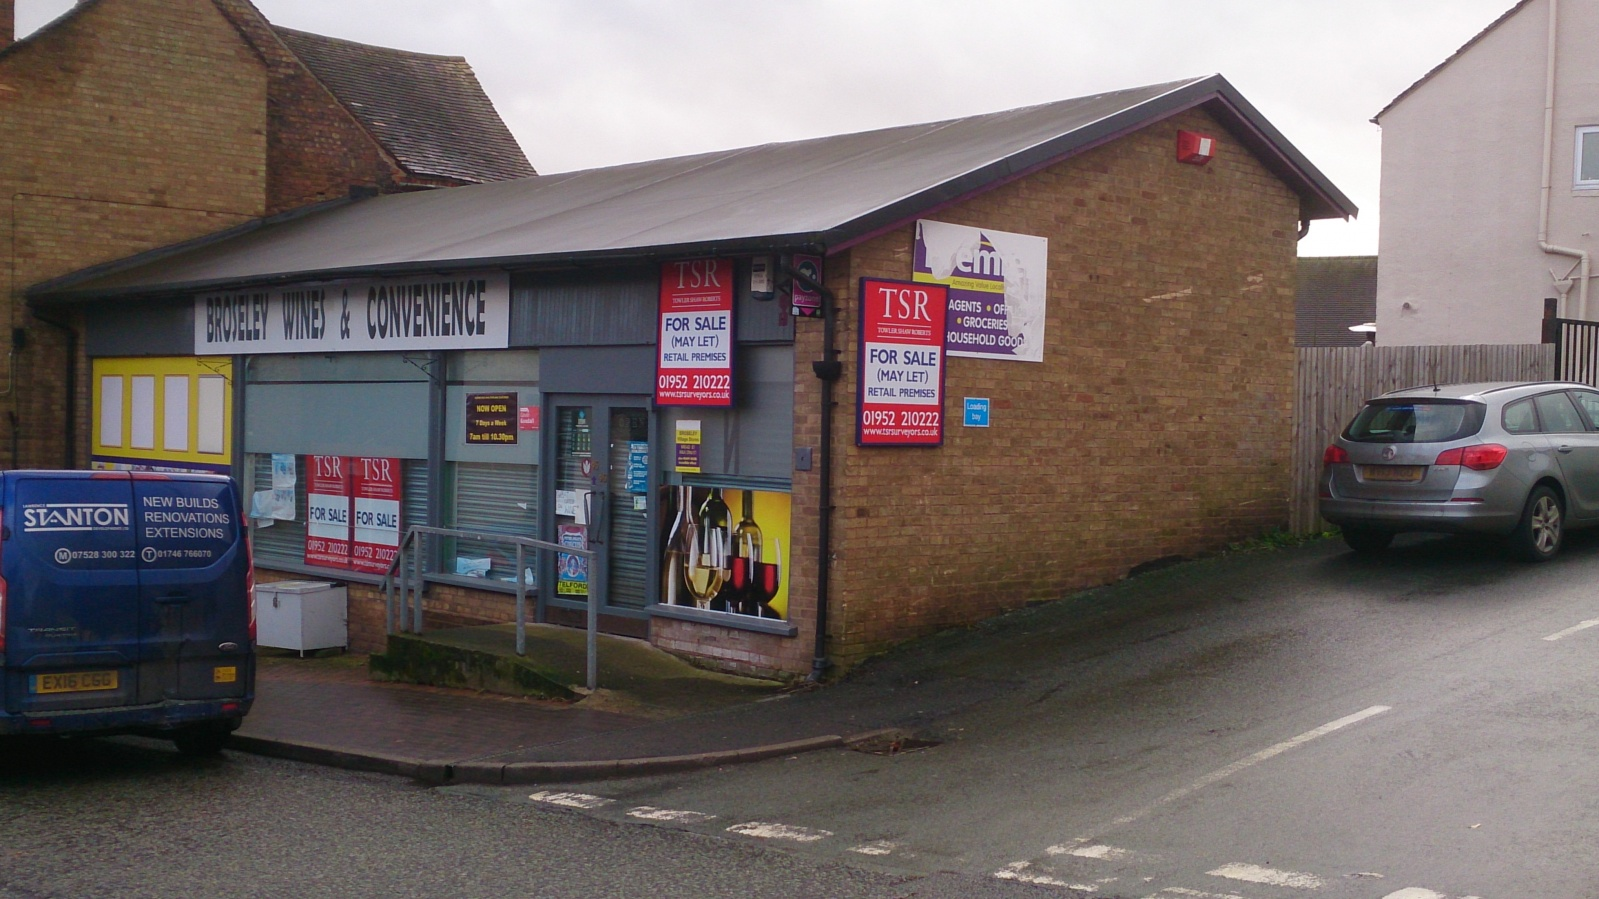 45-46, High Street, Broseley, Telford